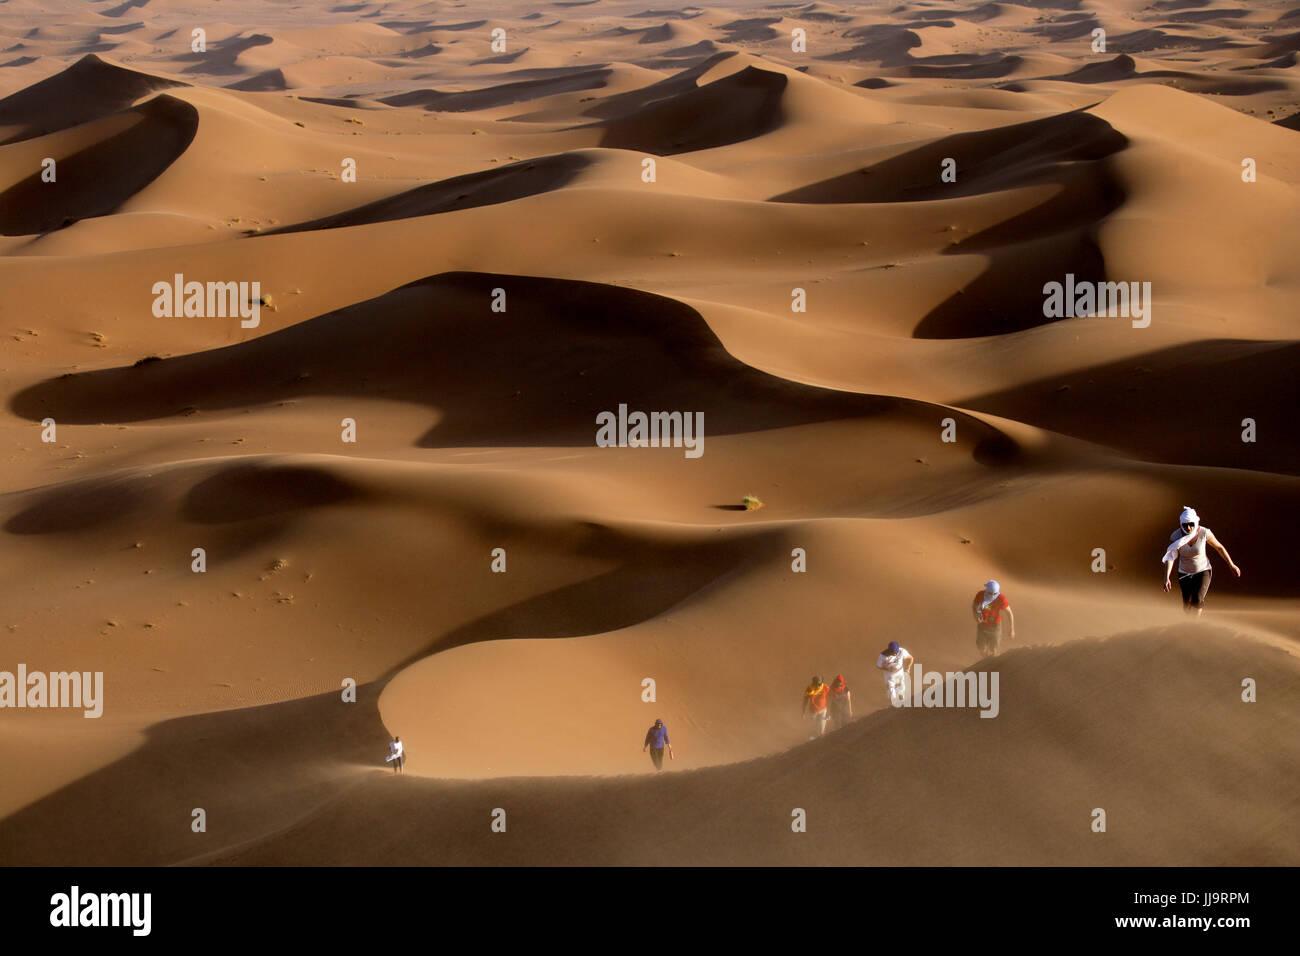 People exploring Erg Chebbi dunes, Morocco, North Africa - Stock Image